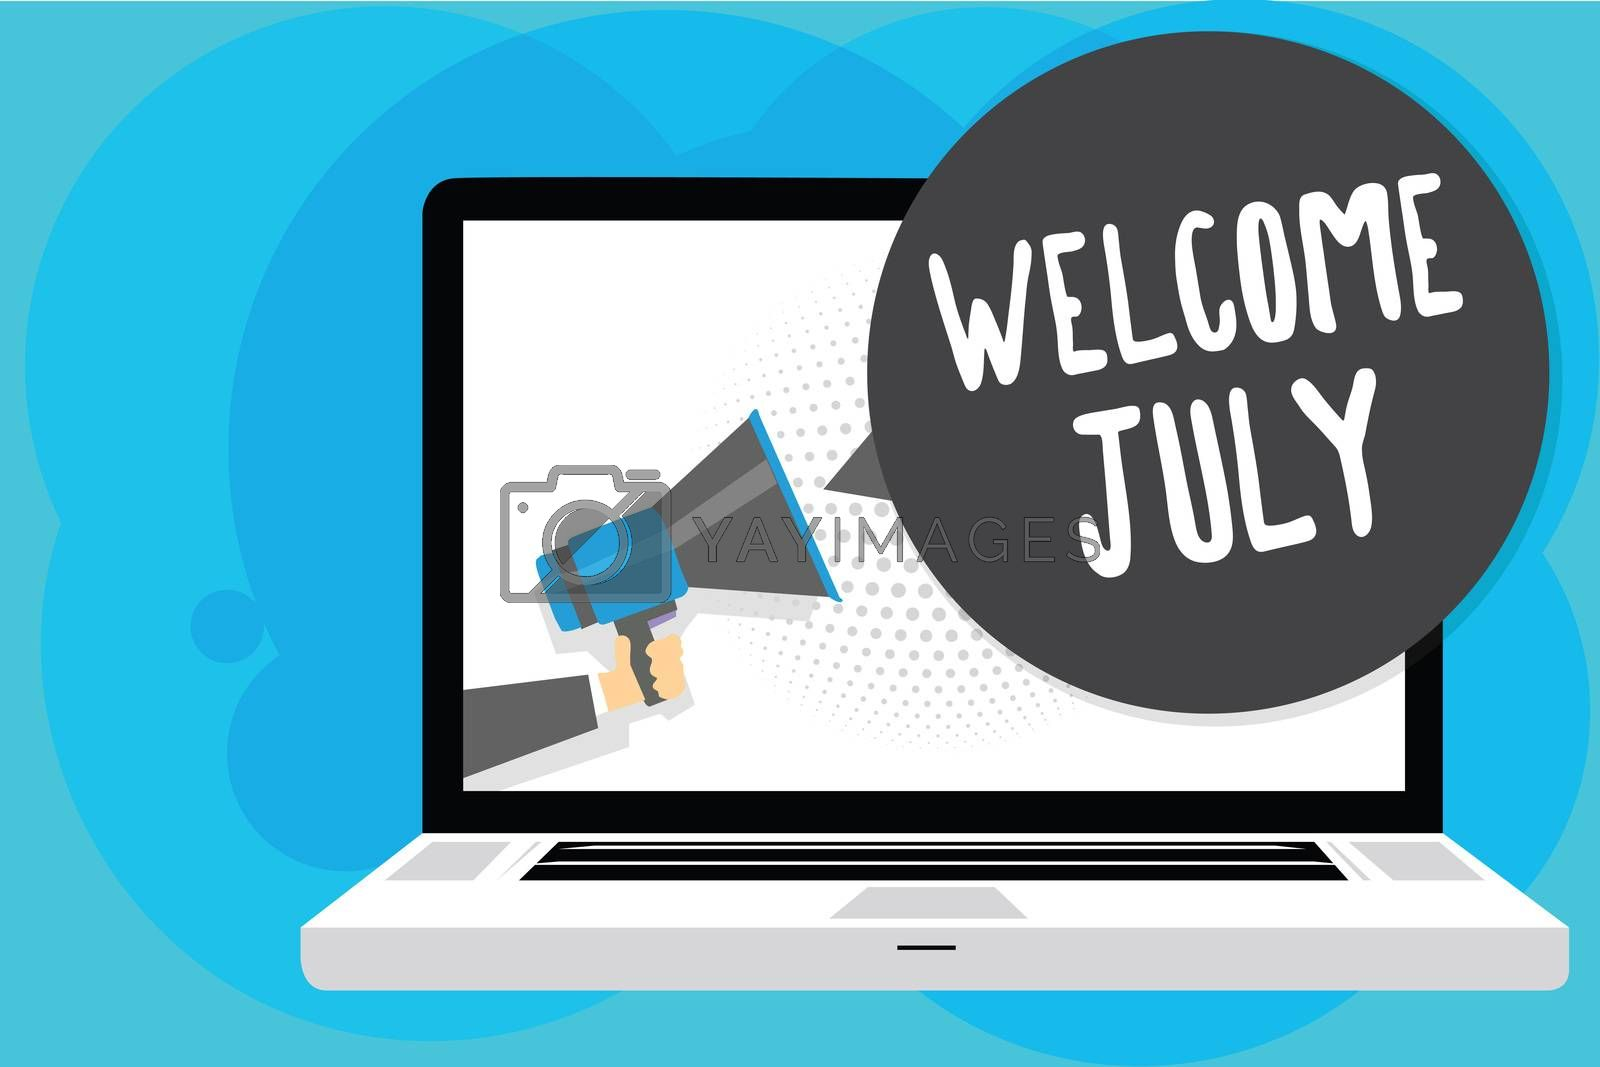 Text sign showing Welcome July. Conceptual photo Calendar Seventh Month 31days Third Quarter New Season Man holding Megaphone loudspeaker computer screen talking speech bubble